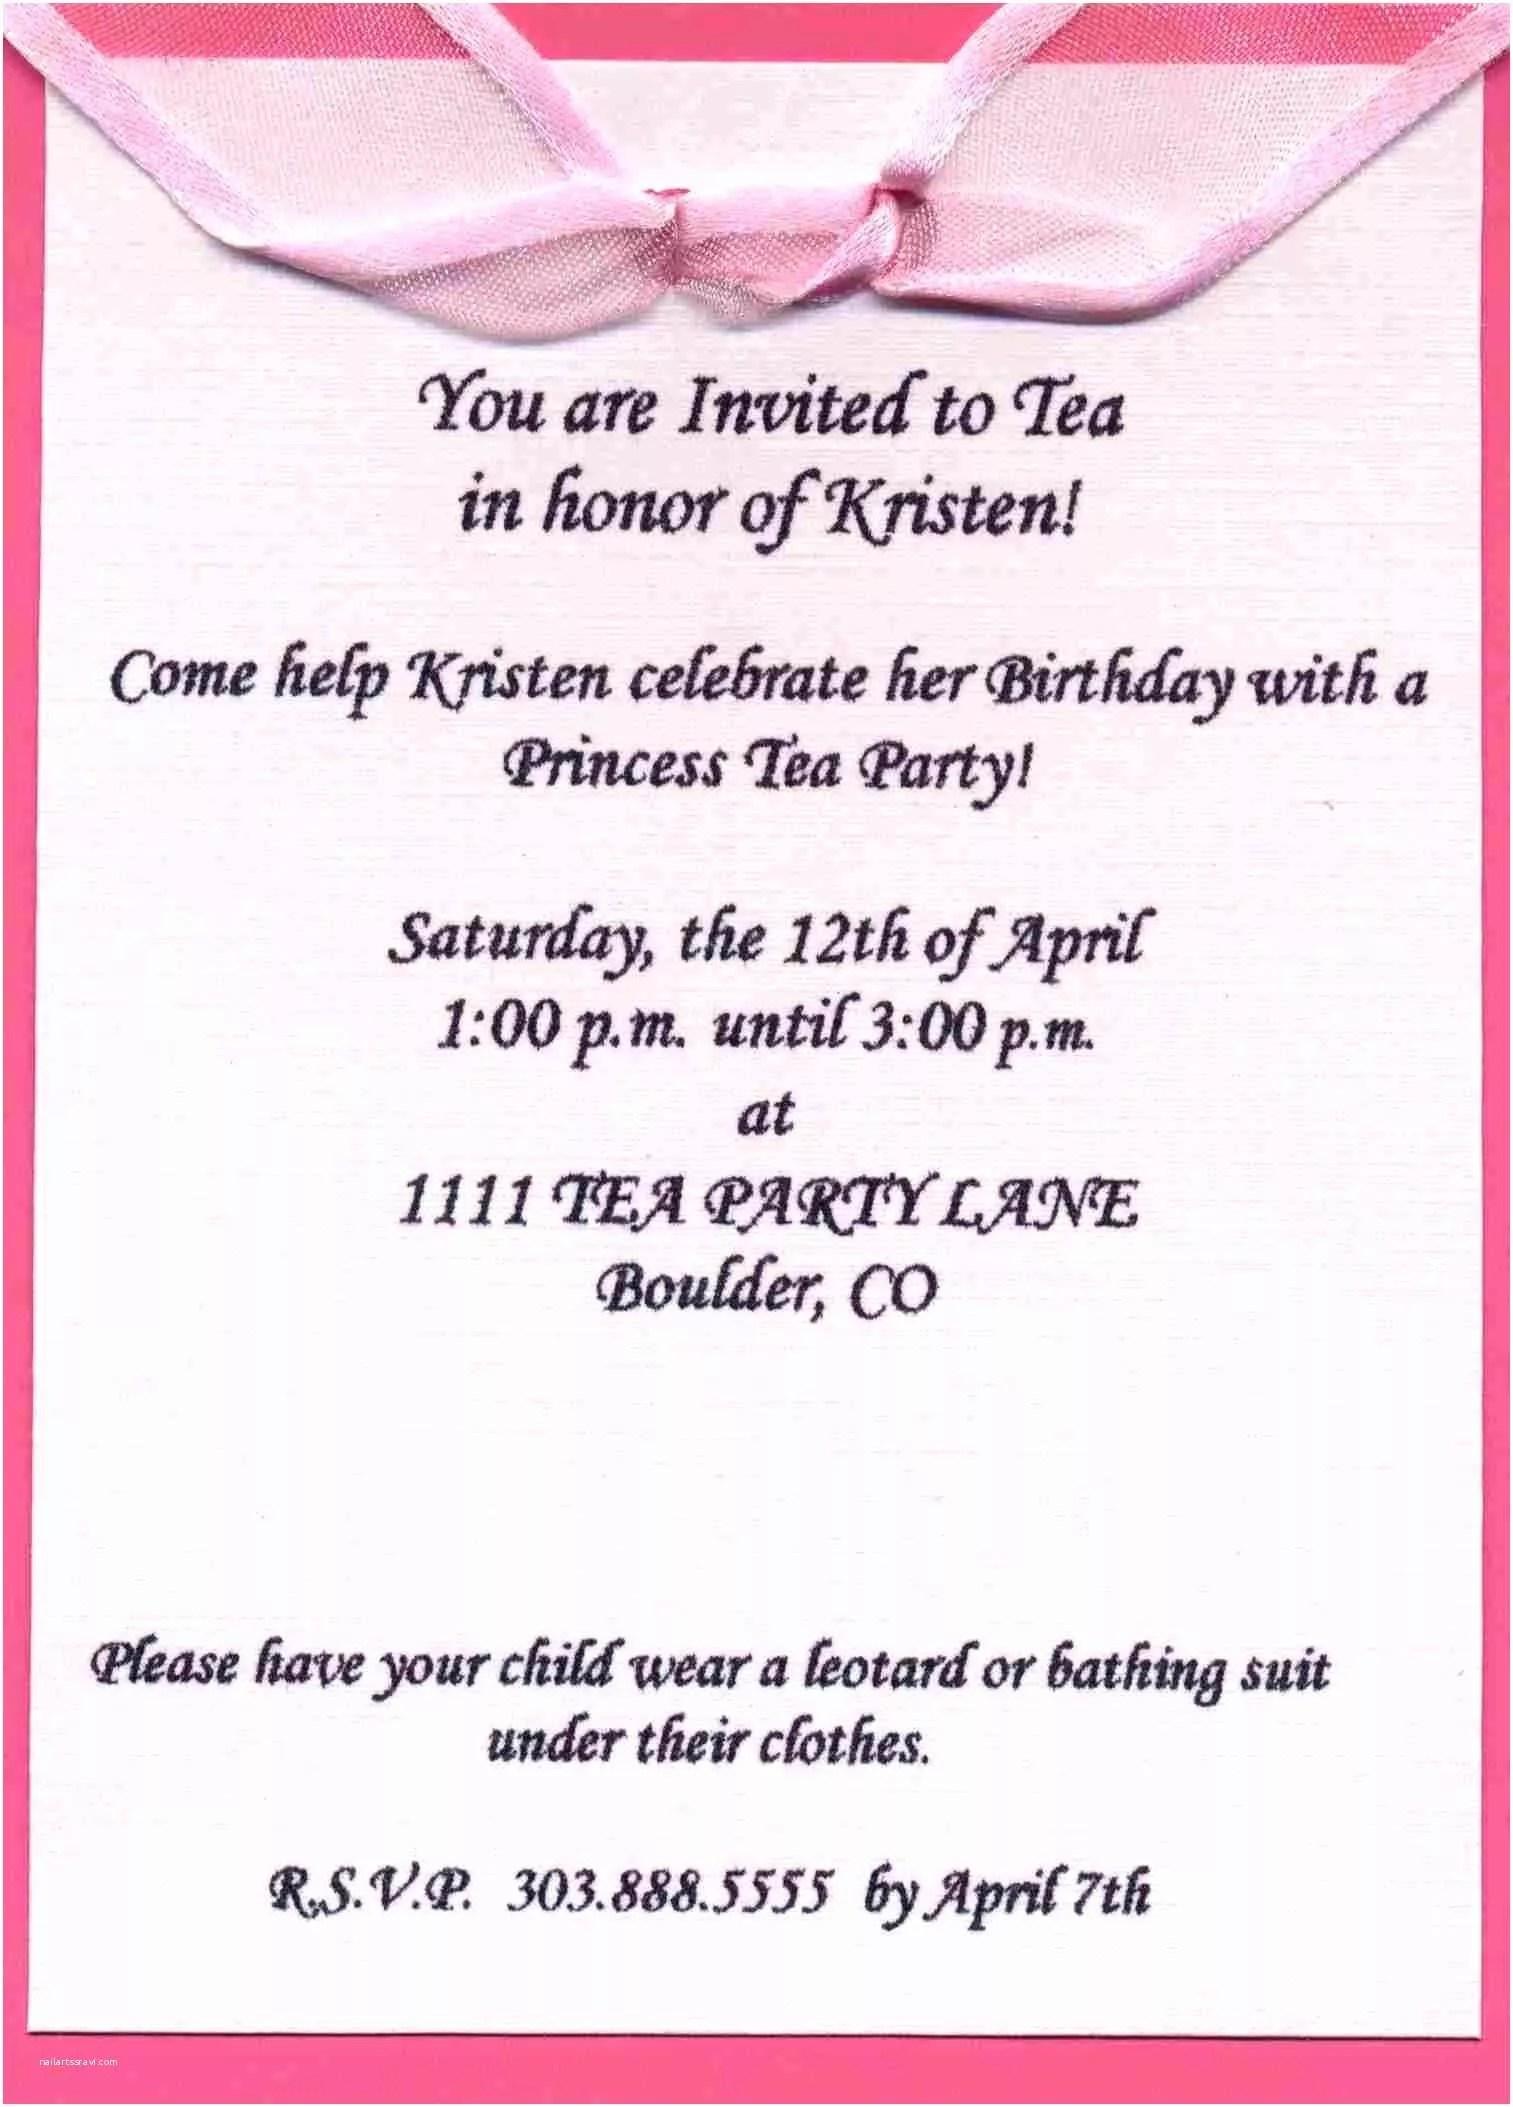 Sample Birthday Invitation Happy Hour Wording Archives Of Jpg 1060x1476